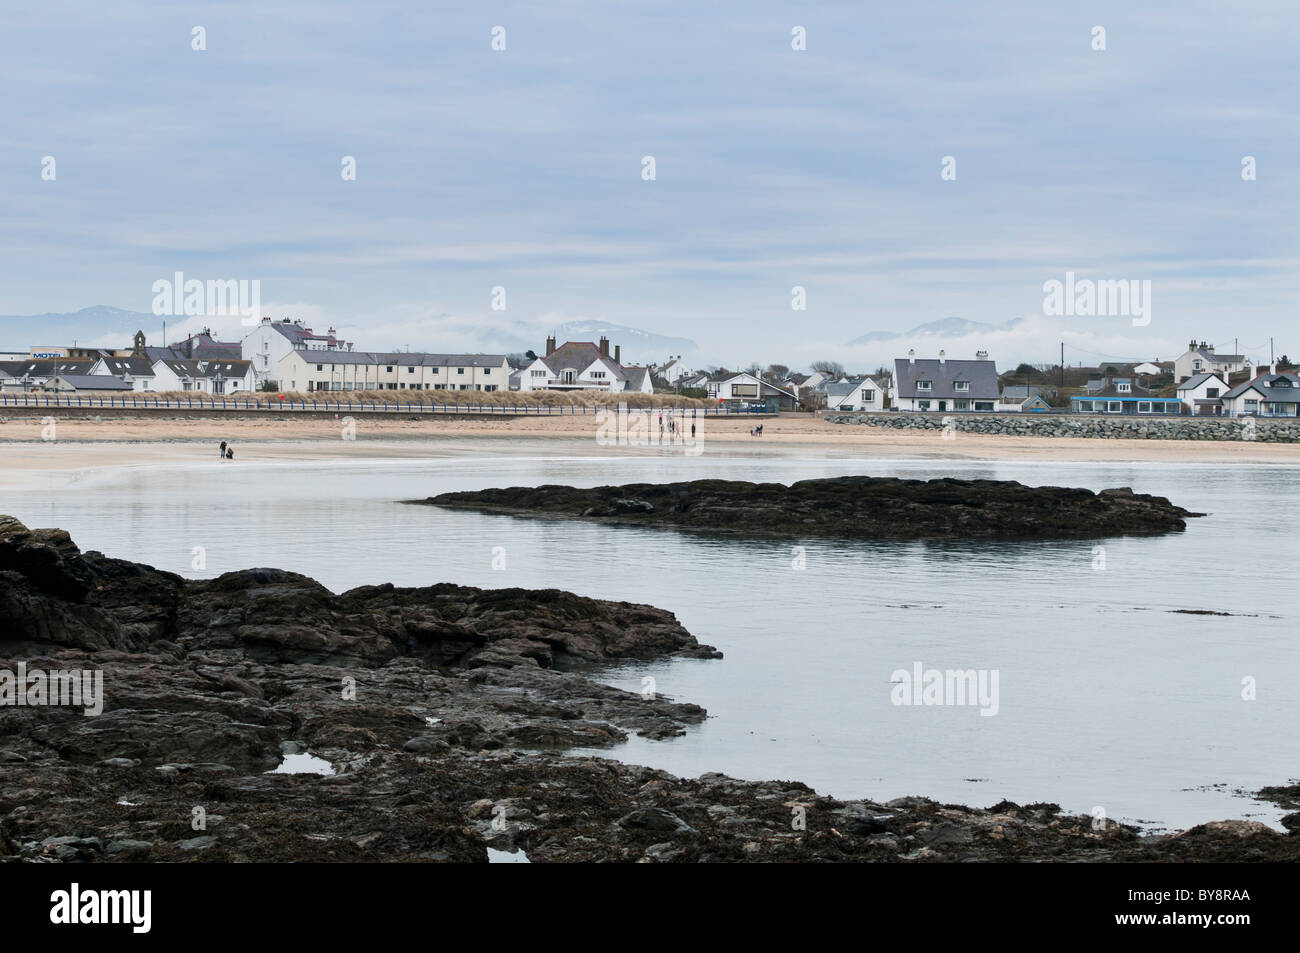 Trearddur Bay, Anglesey, North Wales UK - Stock Image